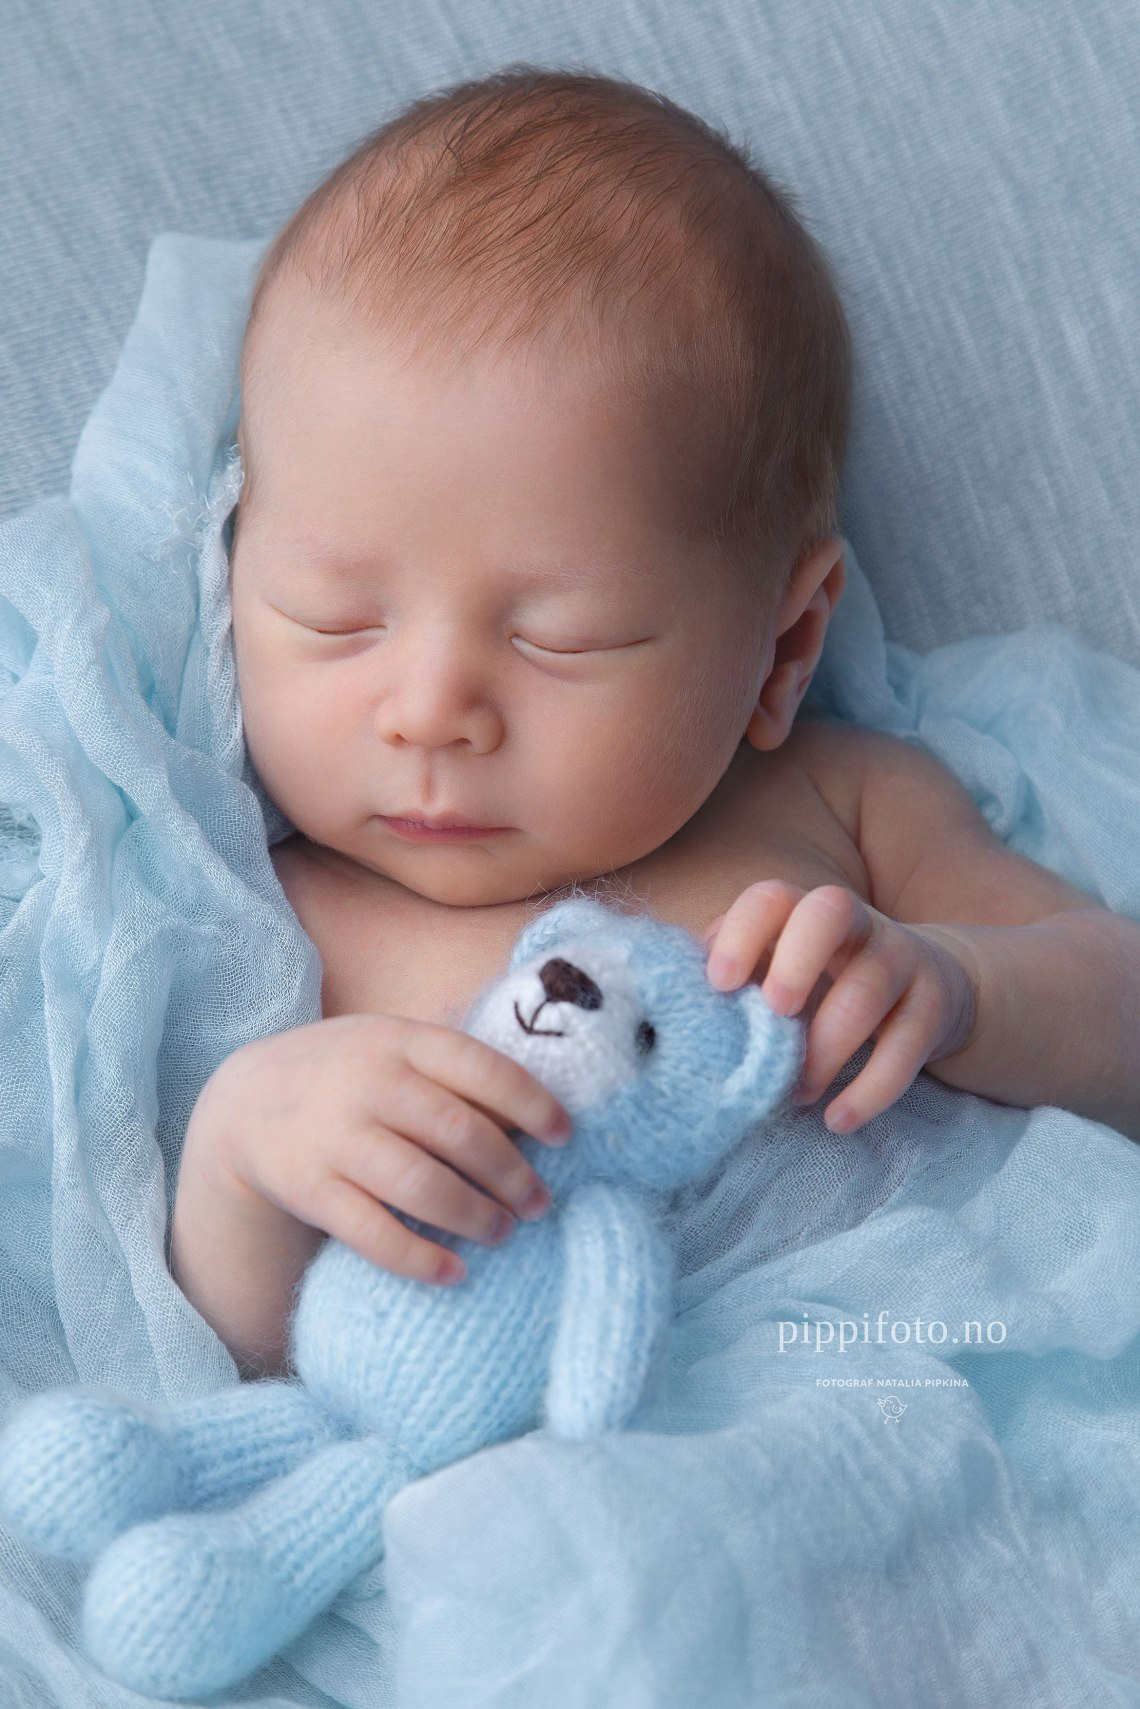 nyfødtfotograf-babyfotografering-nyfødtbaby-newbornphotographer-norway